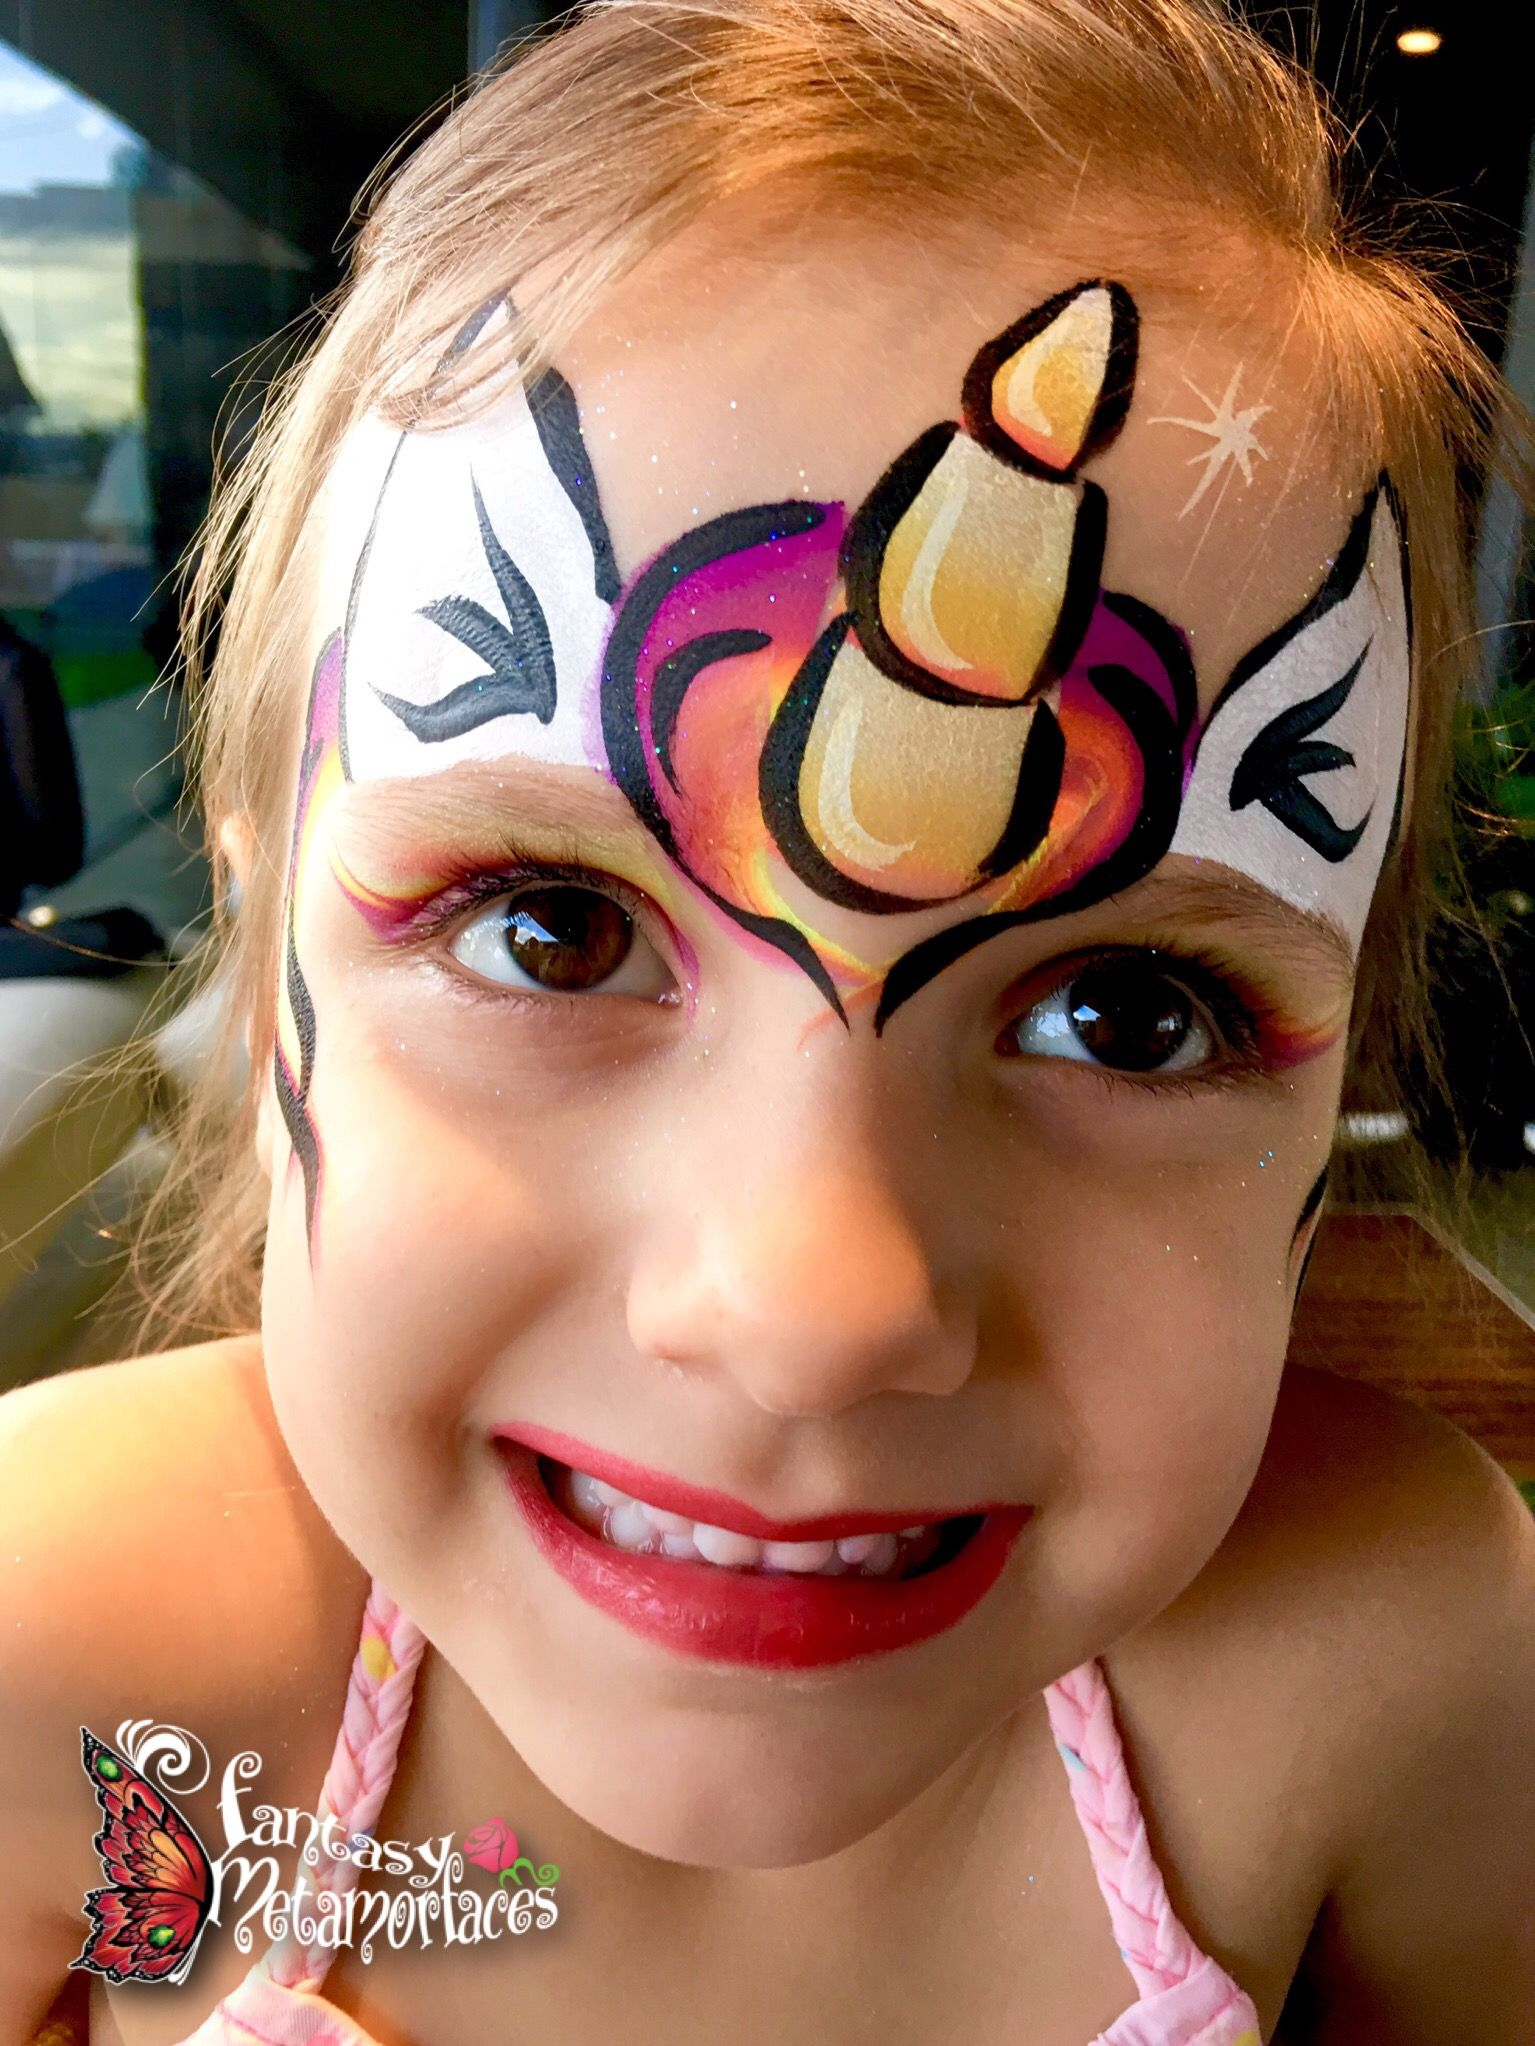 Simple Unicorn Face Paint : simple, unicorn, paint, Unicorn, Painting, Fantasy, Metamorfaces, Easy,, Painting,, Christmas